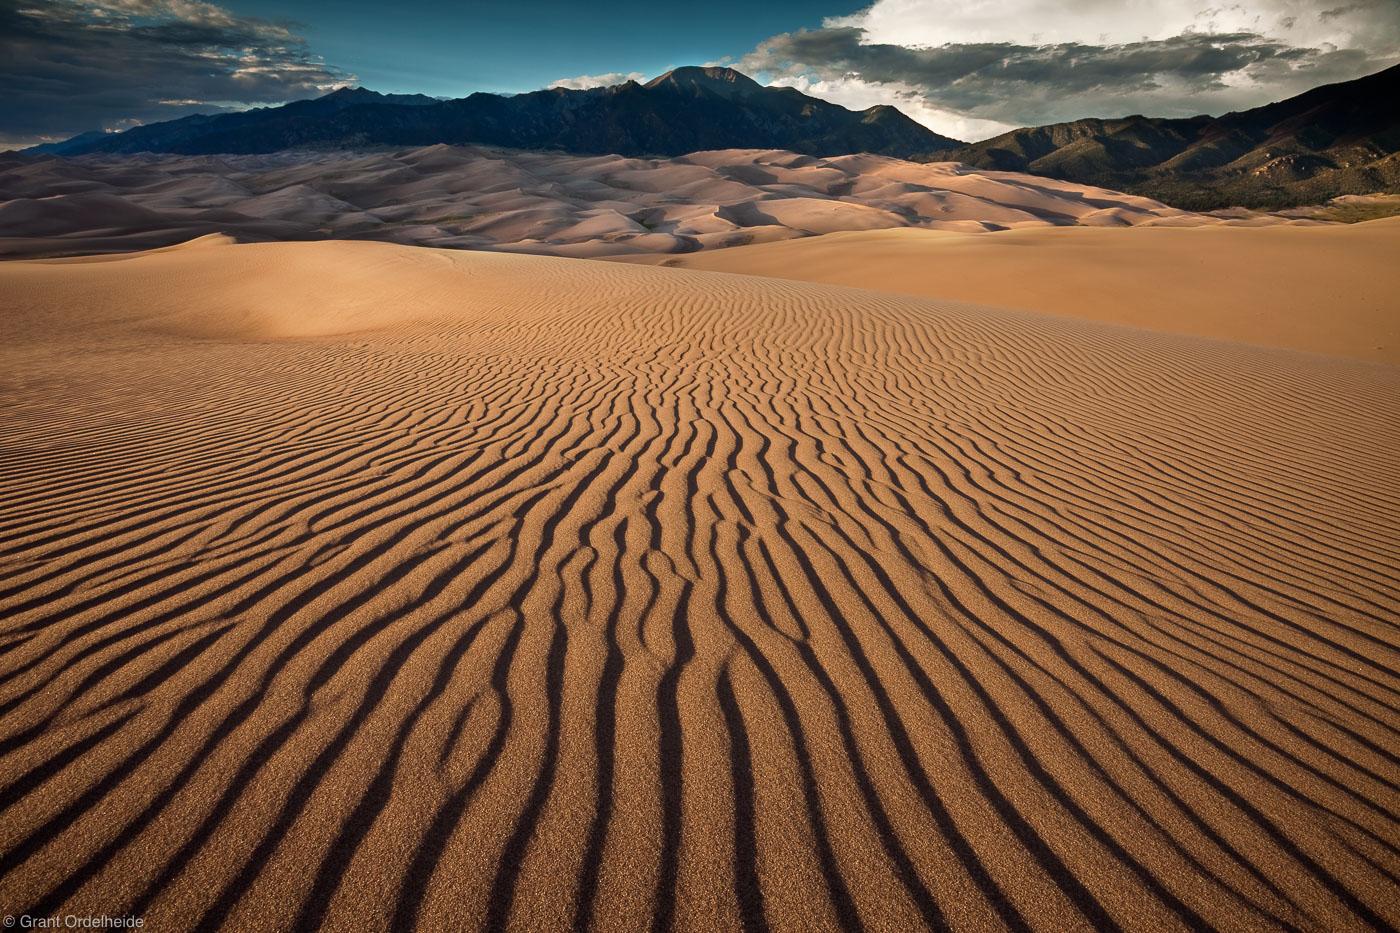 sand, dunes, great, national park, colorado, ripples, mt. herard, sangre de cristos, photo